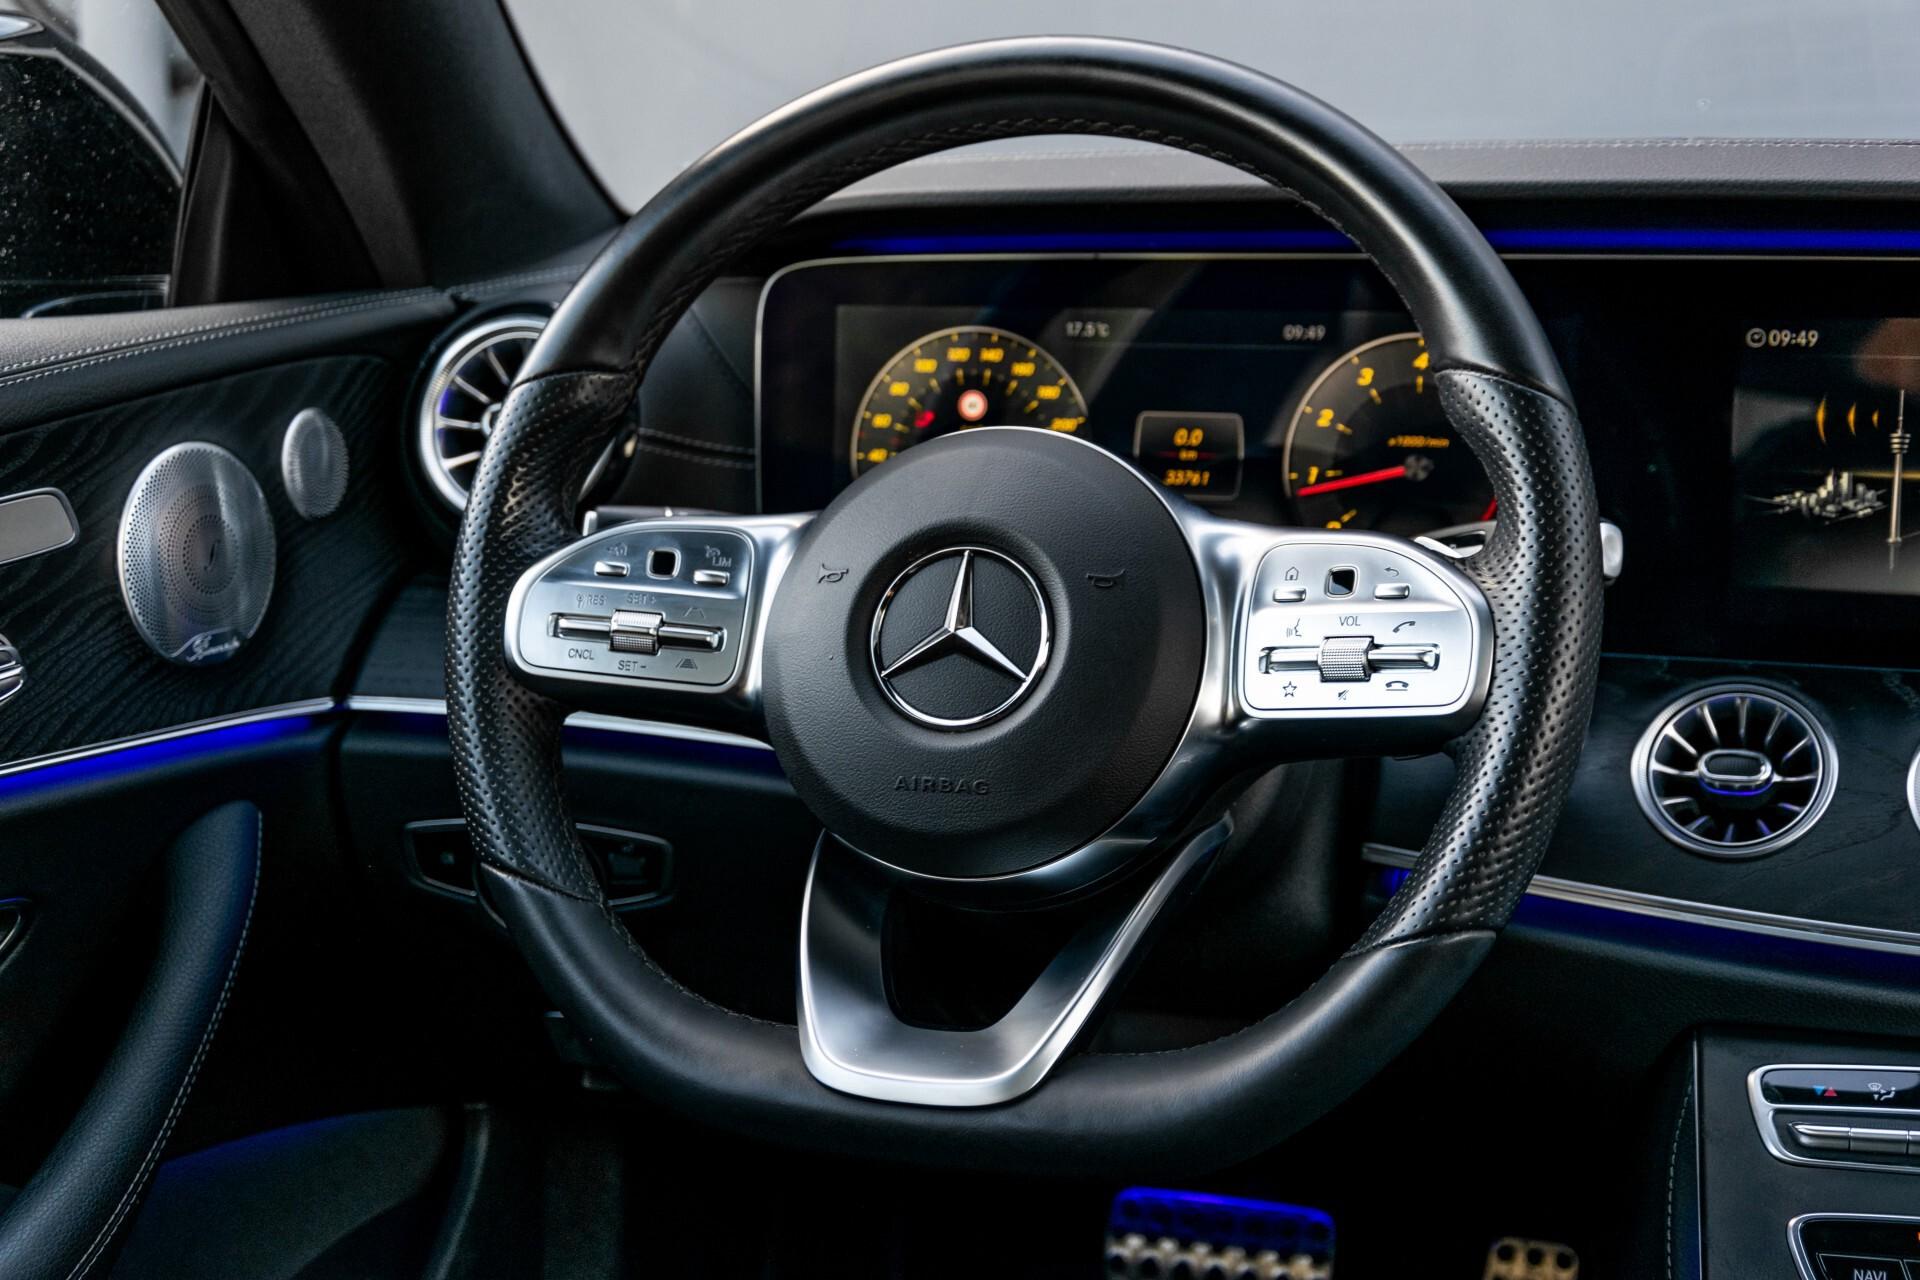 Mercedes-Benz E-Klasse Coupé 300 AMG Panorama/Rij-assist/Keyless/Massage/Memory/HUD/Standkachel/Night Aut9 Foto 5